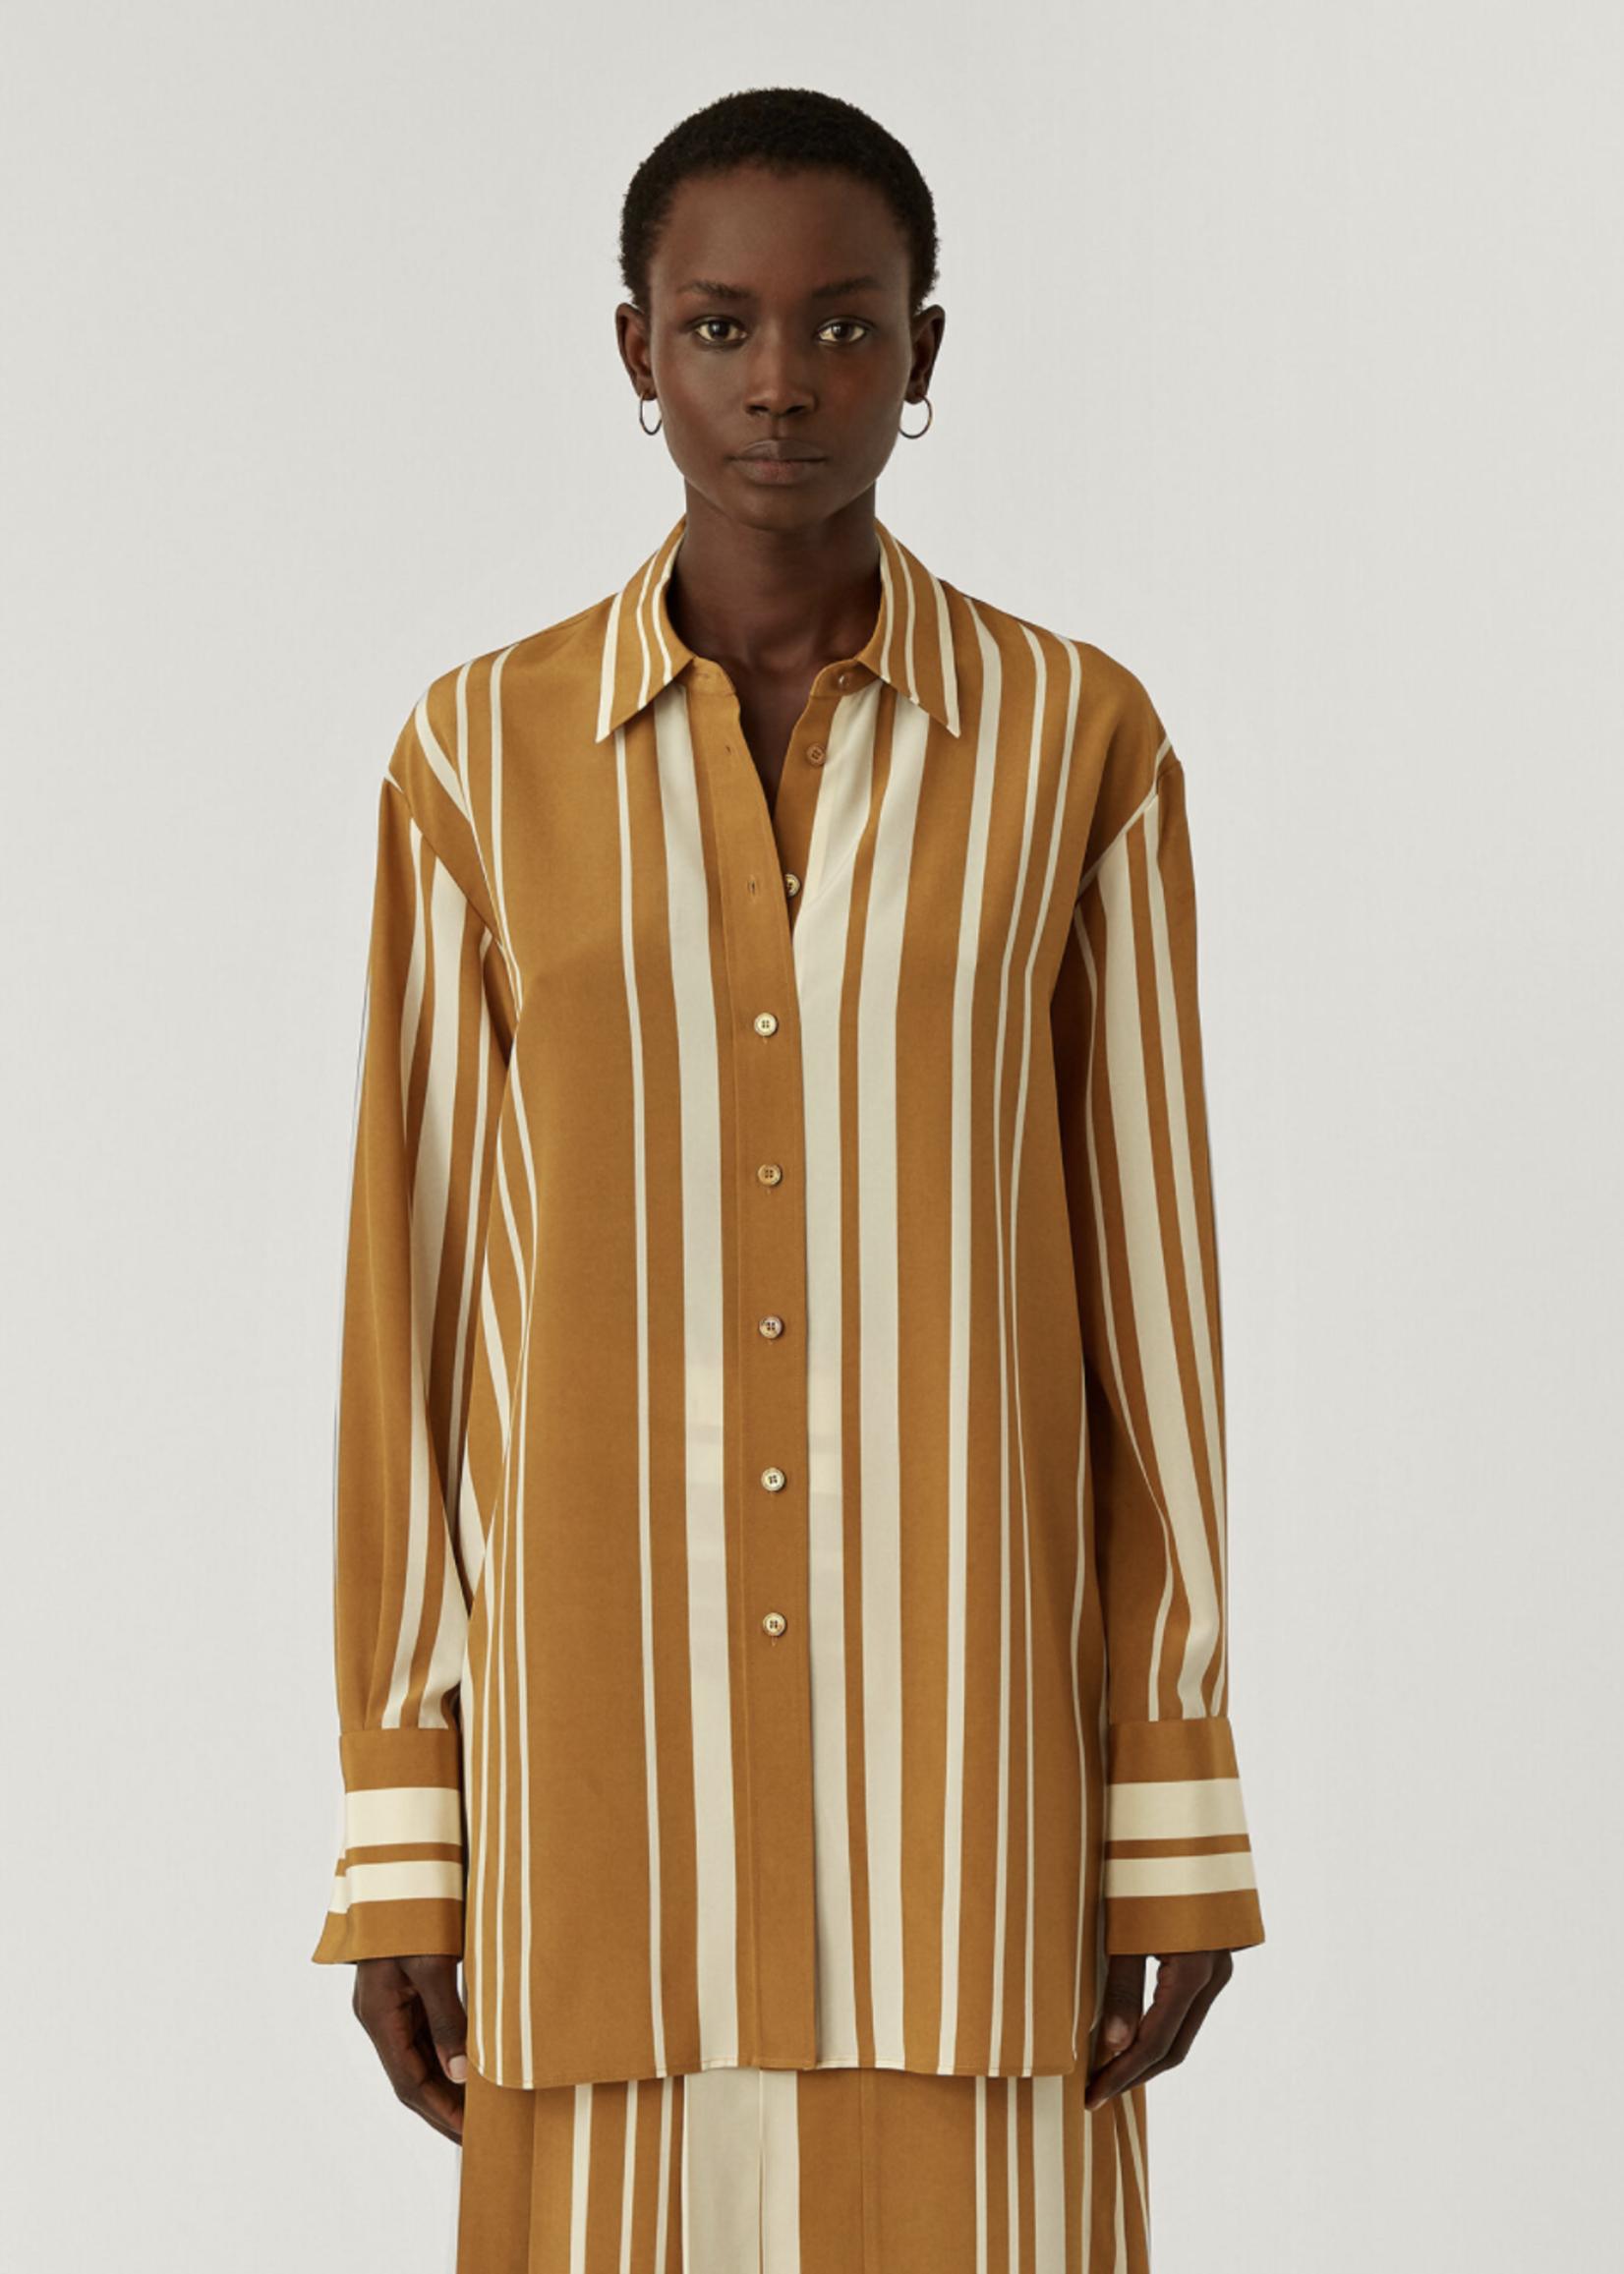 Joseph joseph brooks silk stripes grey/ocre